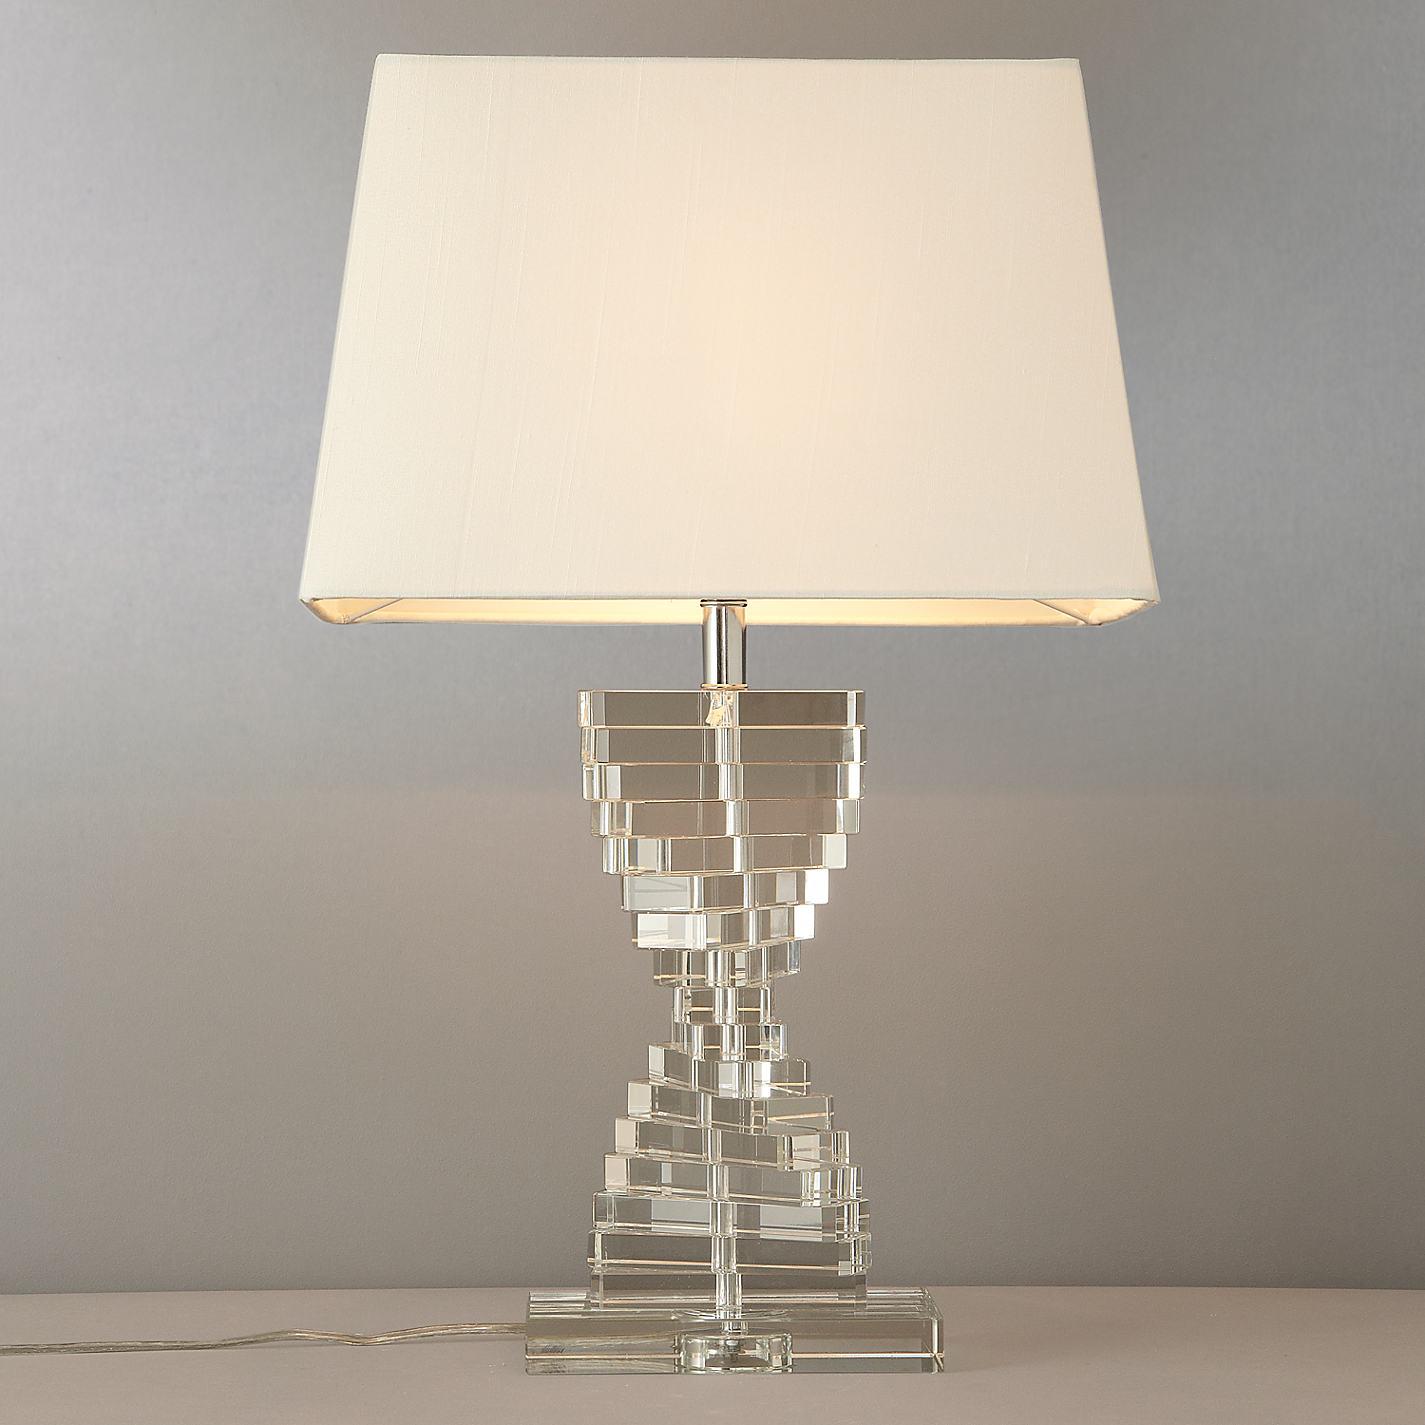 ralph lauren lamps tk maxx w rtersee public relations. Black Bedroom Furniture Sets. Home Design Ideas